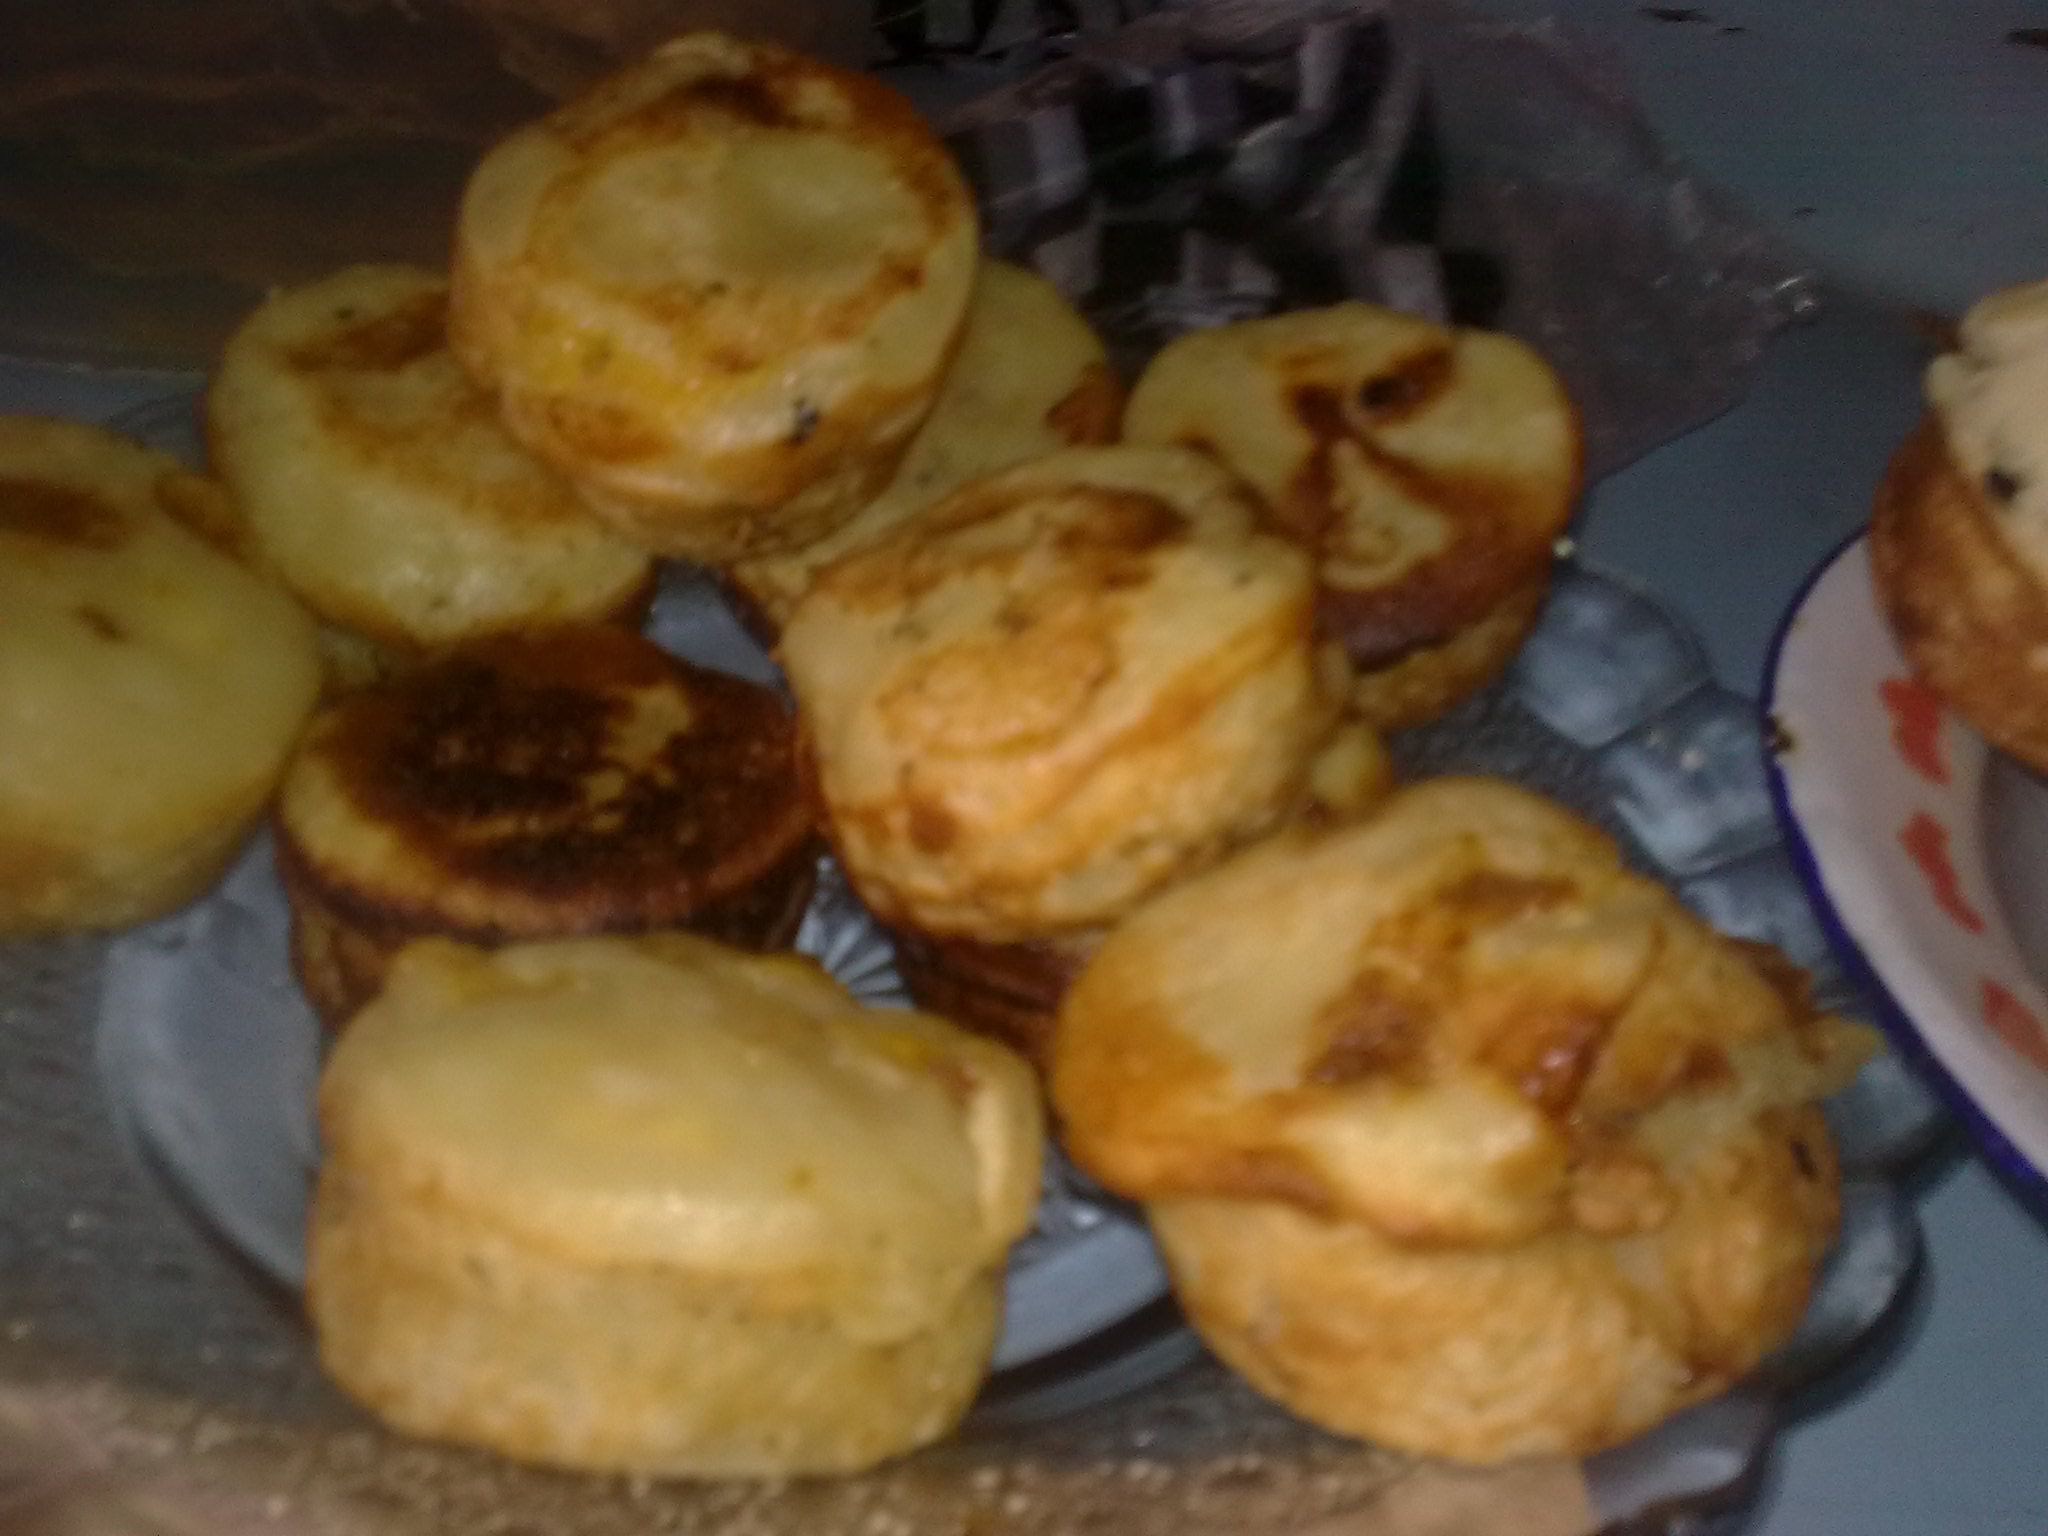 Kue Khas Banjarmasin Kalimantan Selatan Kue Makanan Kue Pisang